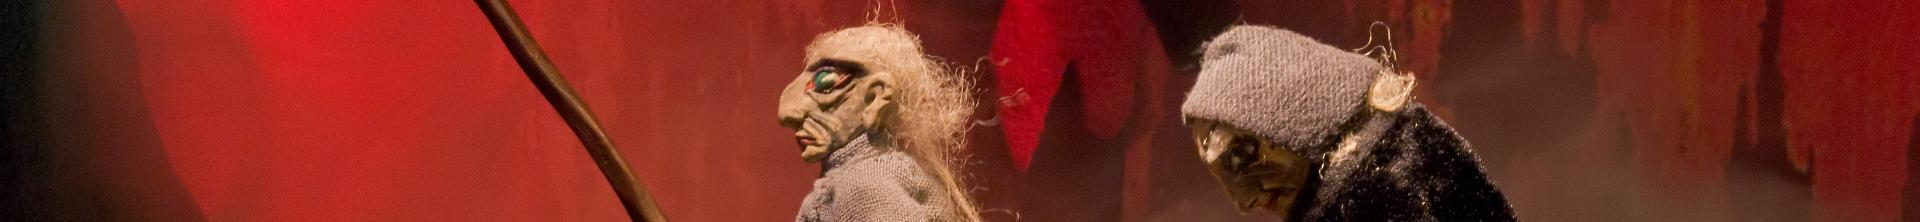 Szene aus Doctor Fausts Höllenfahrt - Copyright Lingener Marionettentheater